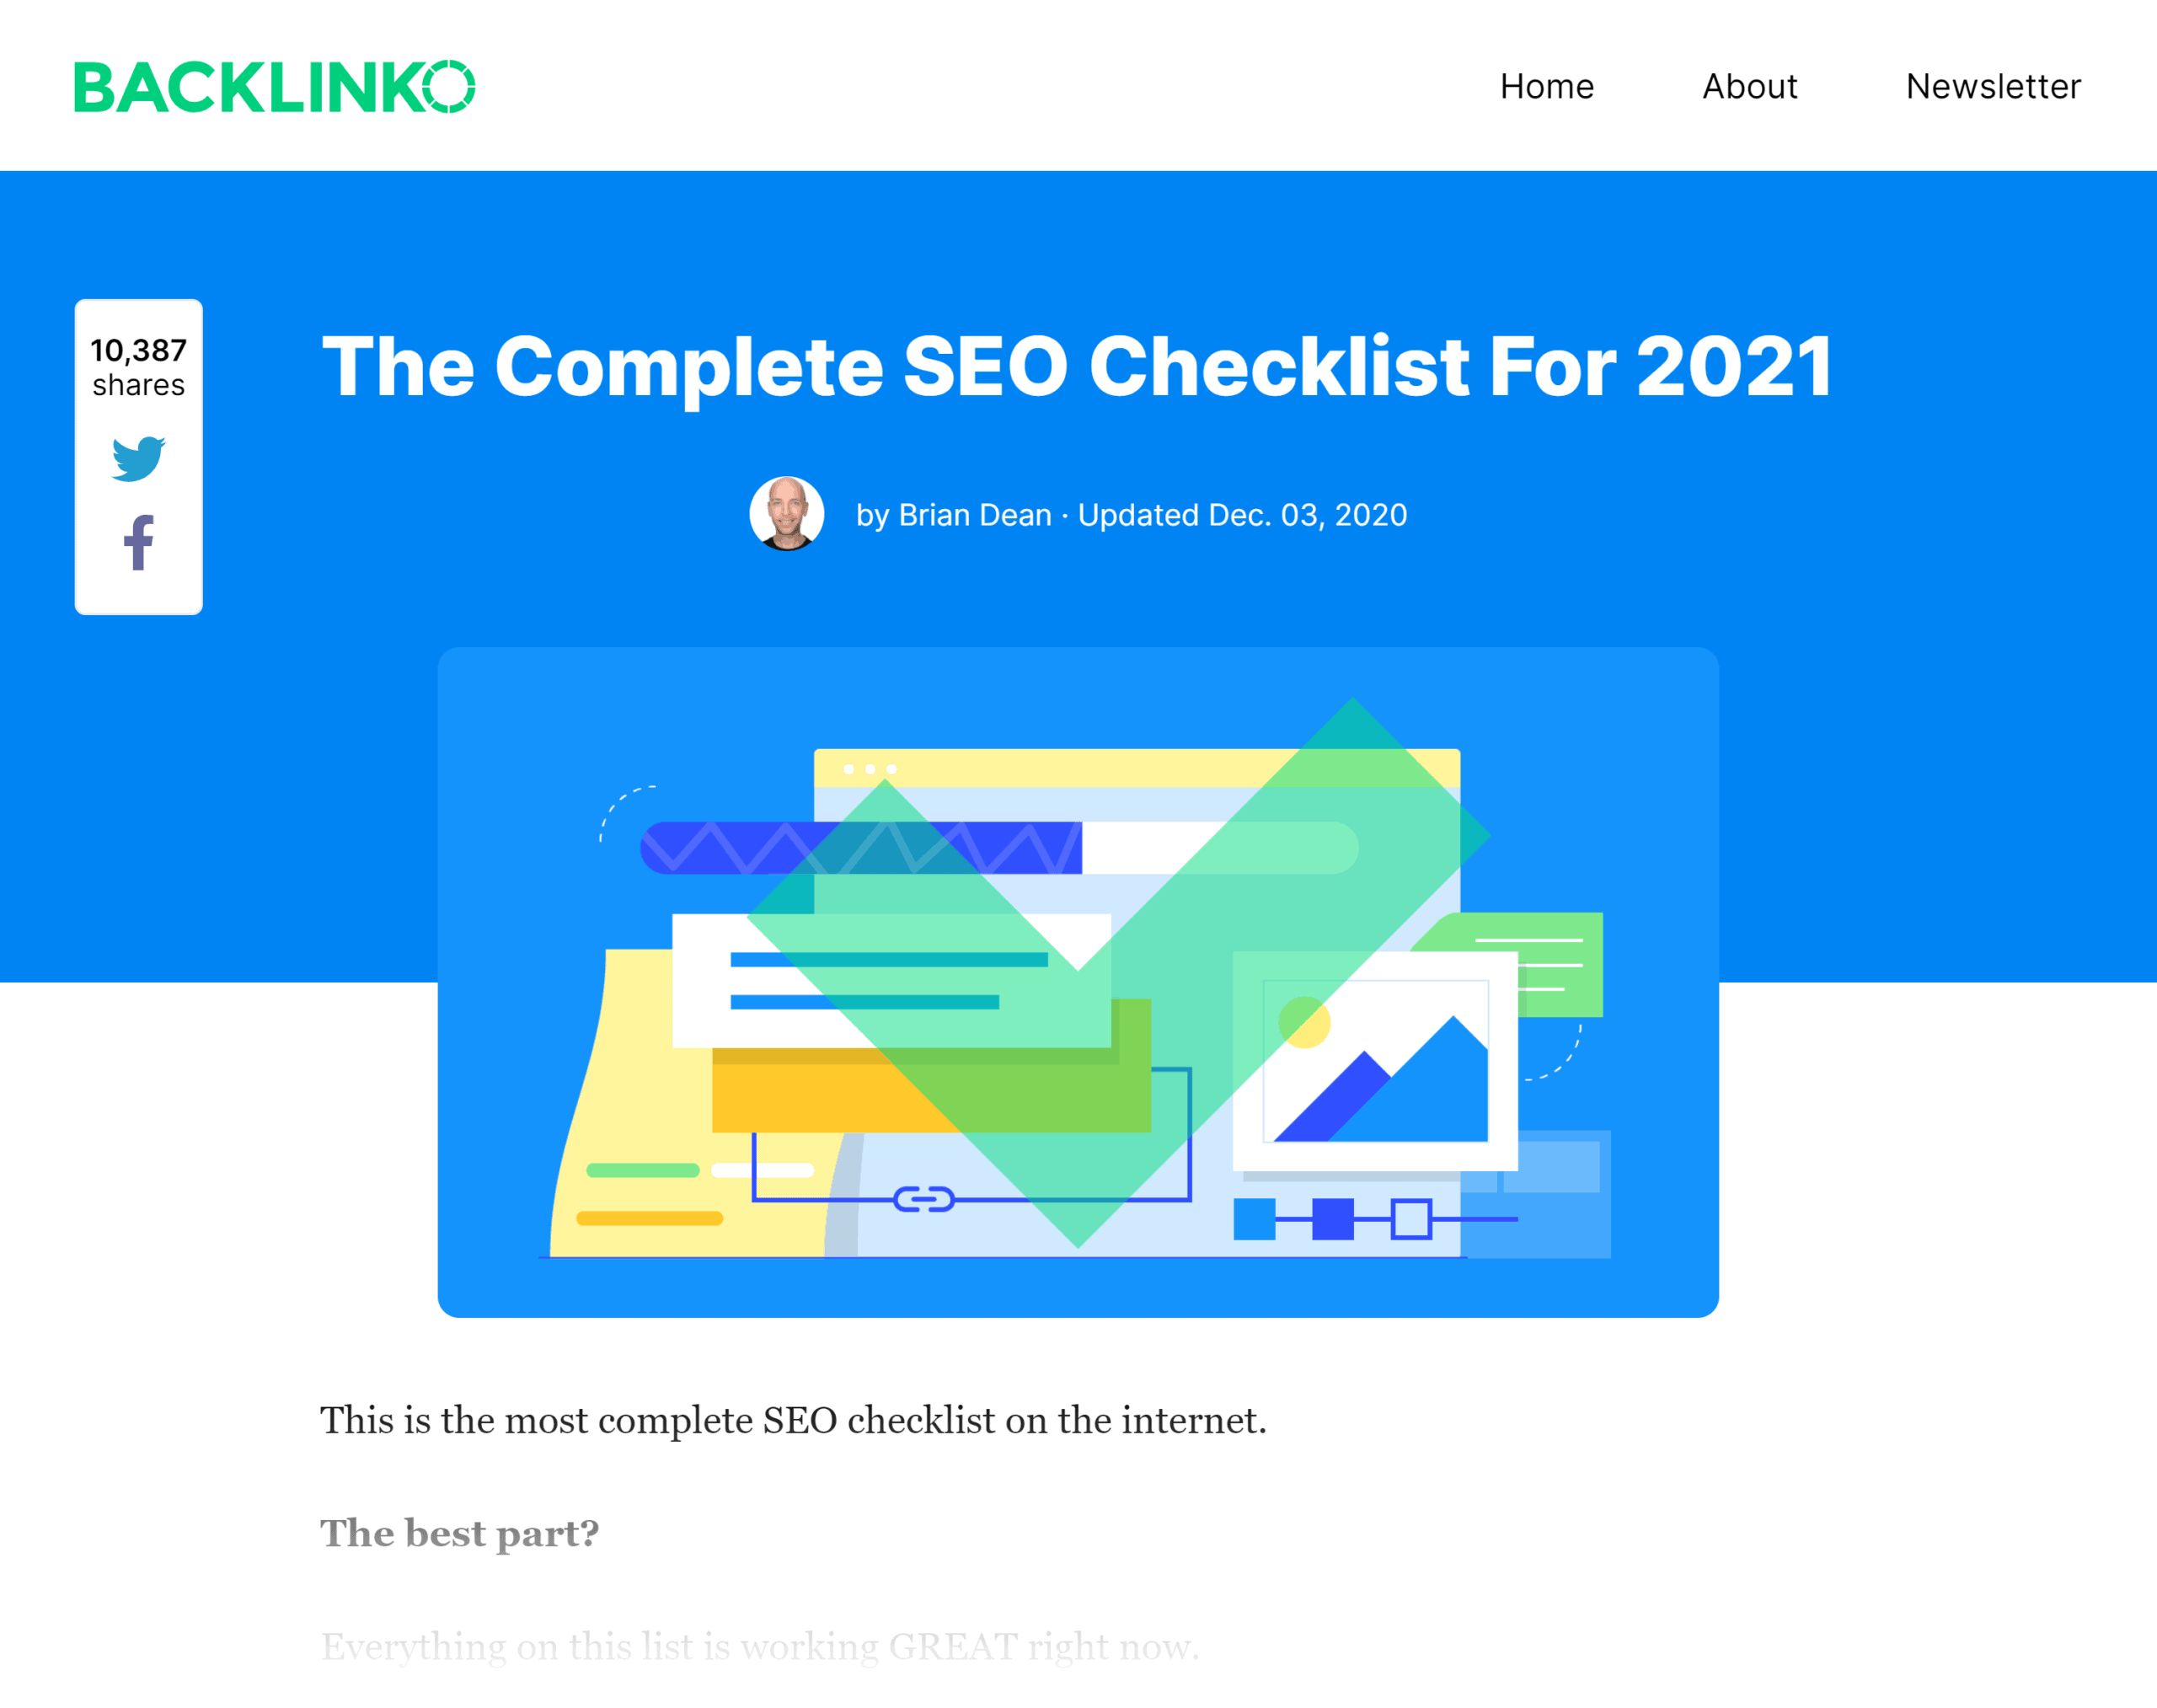 Backlinko – SEO Checklist